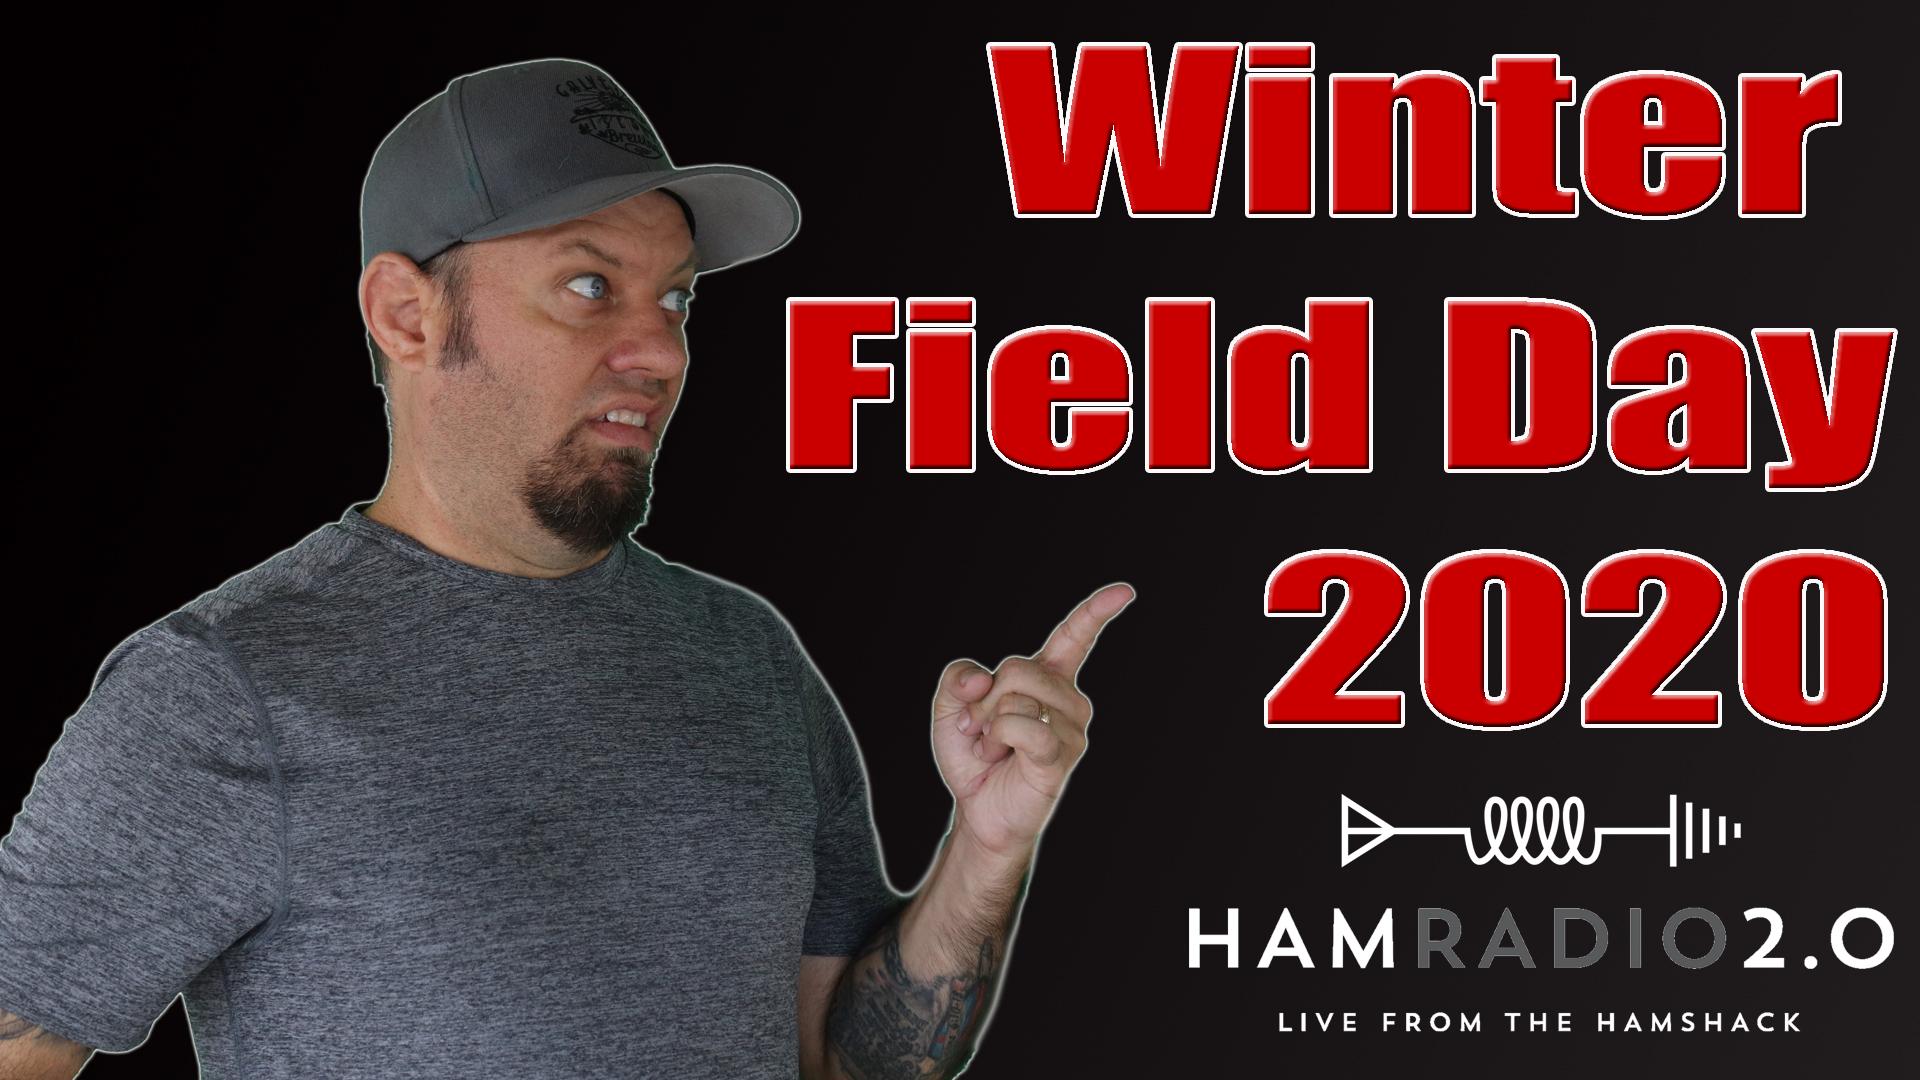 Episode 307: Winter Field Day 2020 for Ham Radio